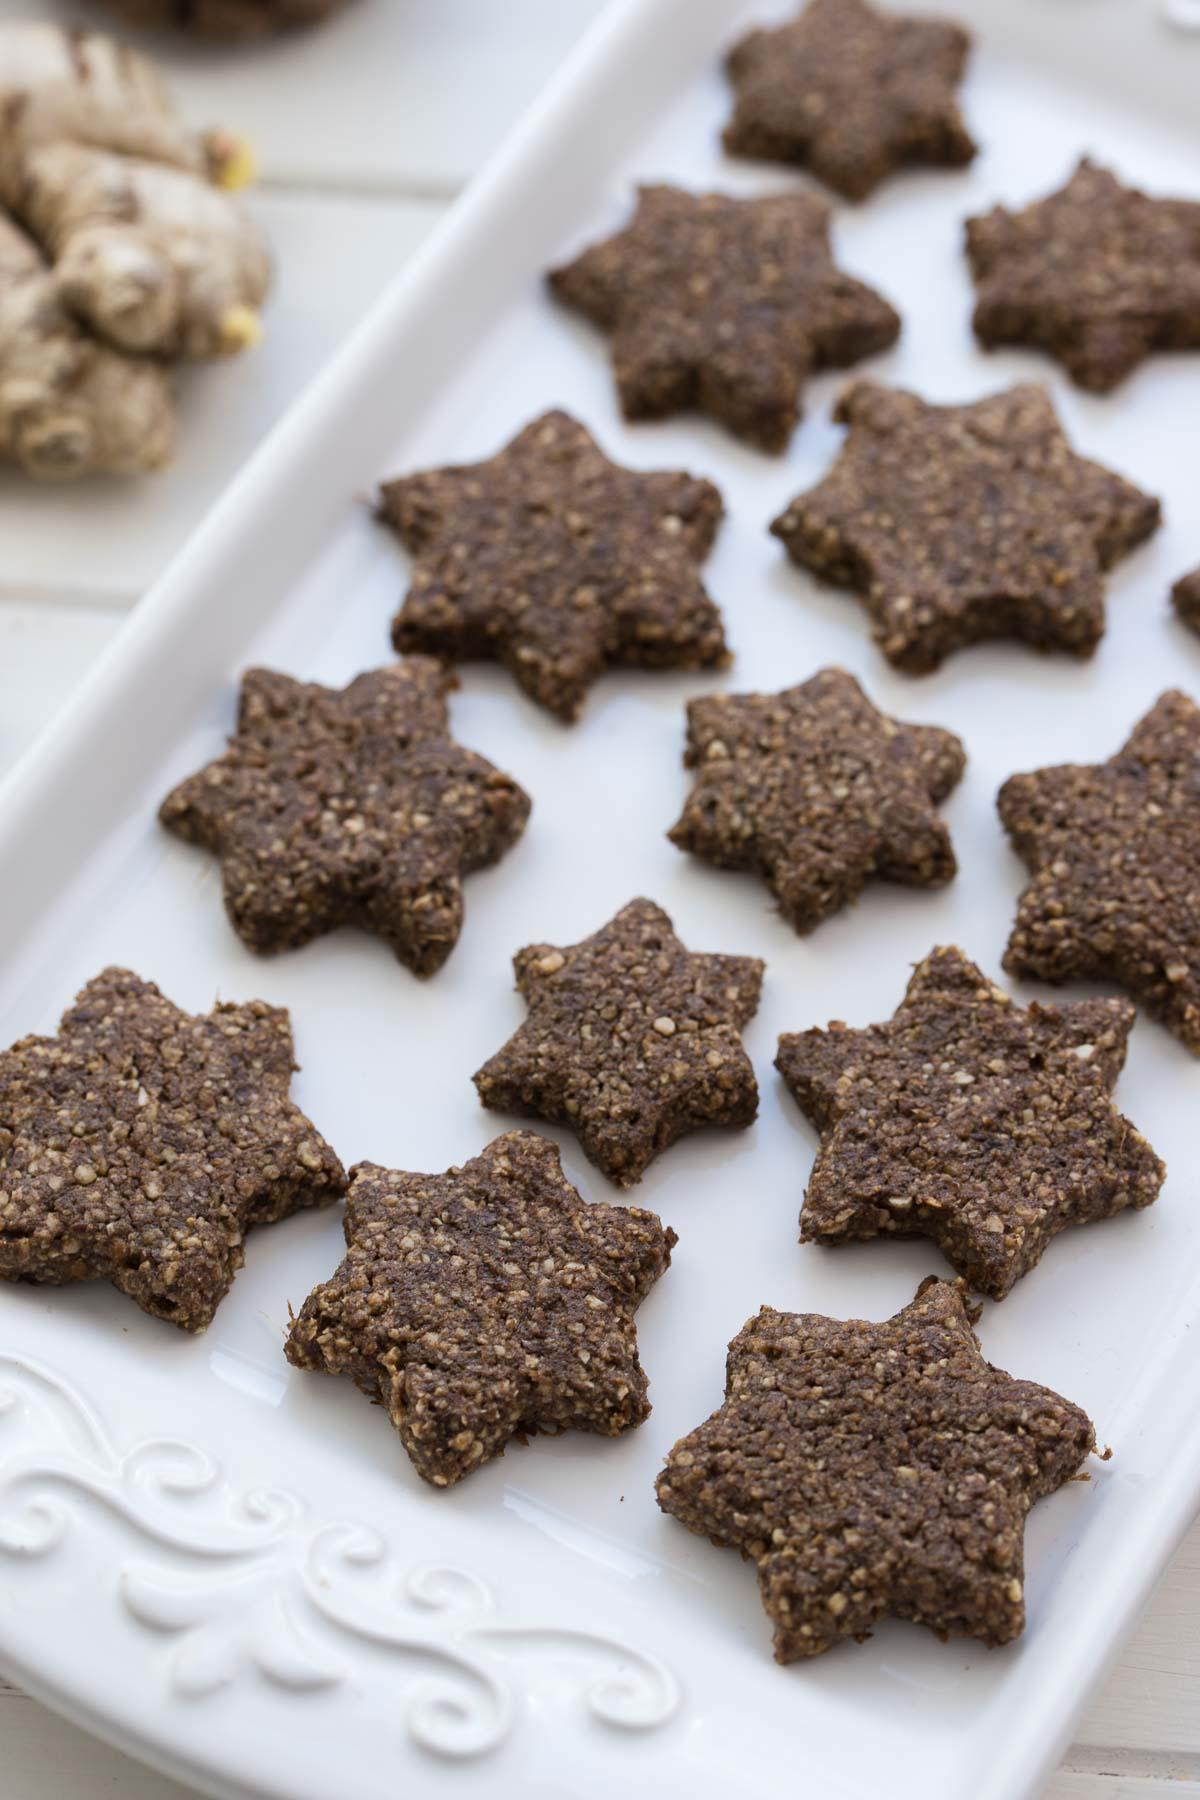 glutenfreie ingwer kekse rezept elle republic gesund backen. Black Bedroom Furniture Sets. Home Design Ideas